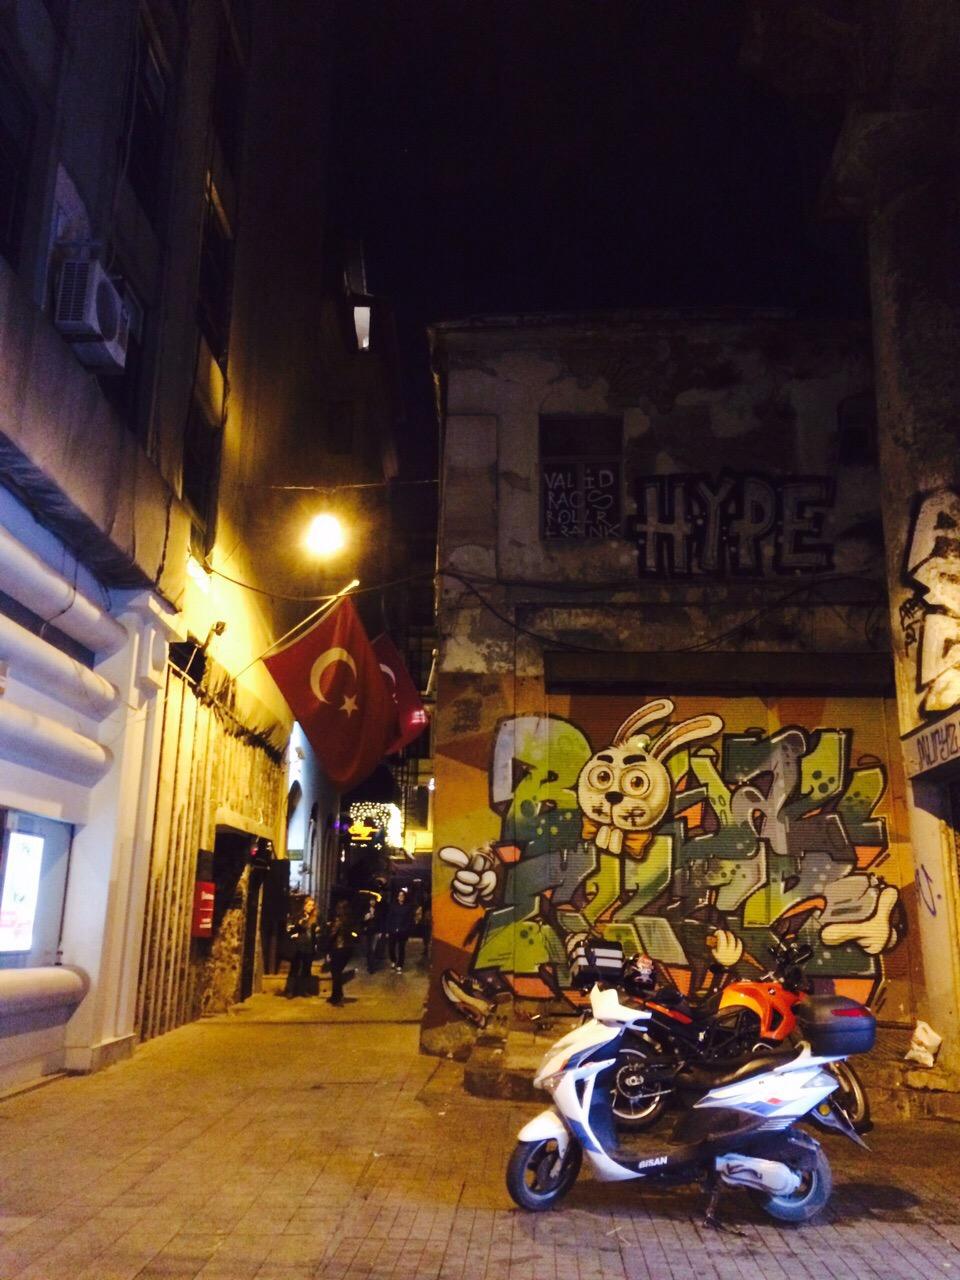 Taksim in Istanbul Turkey